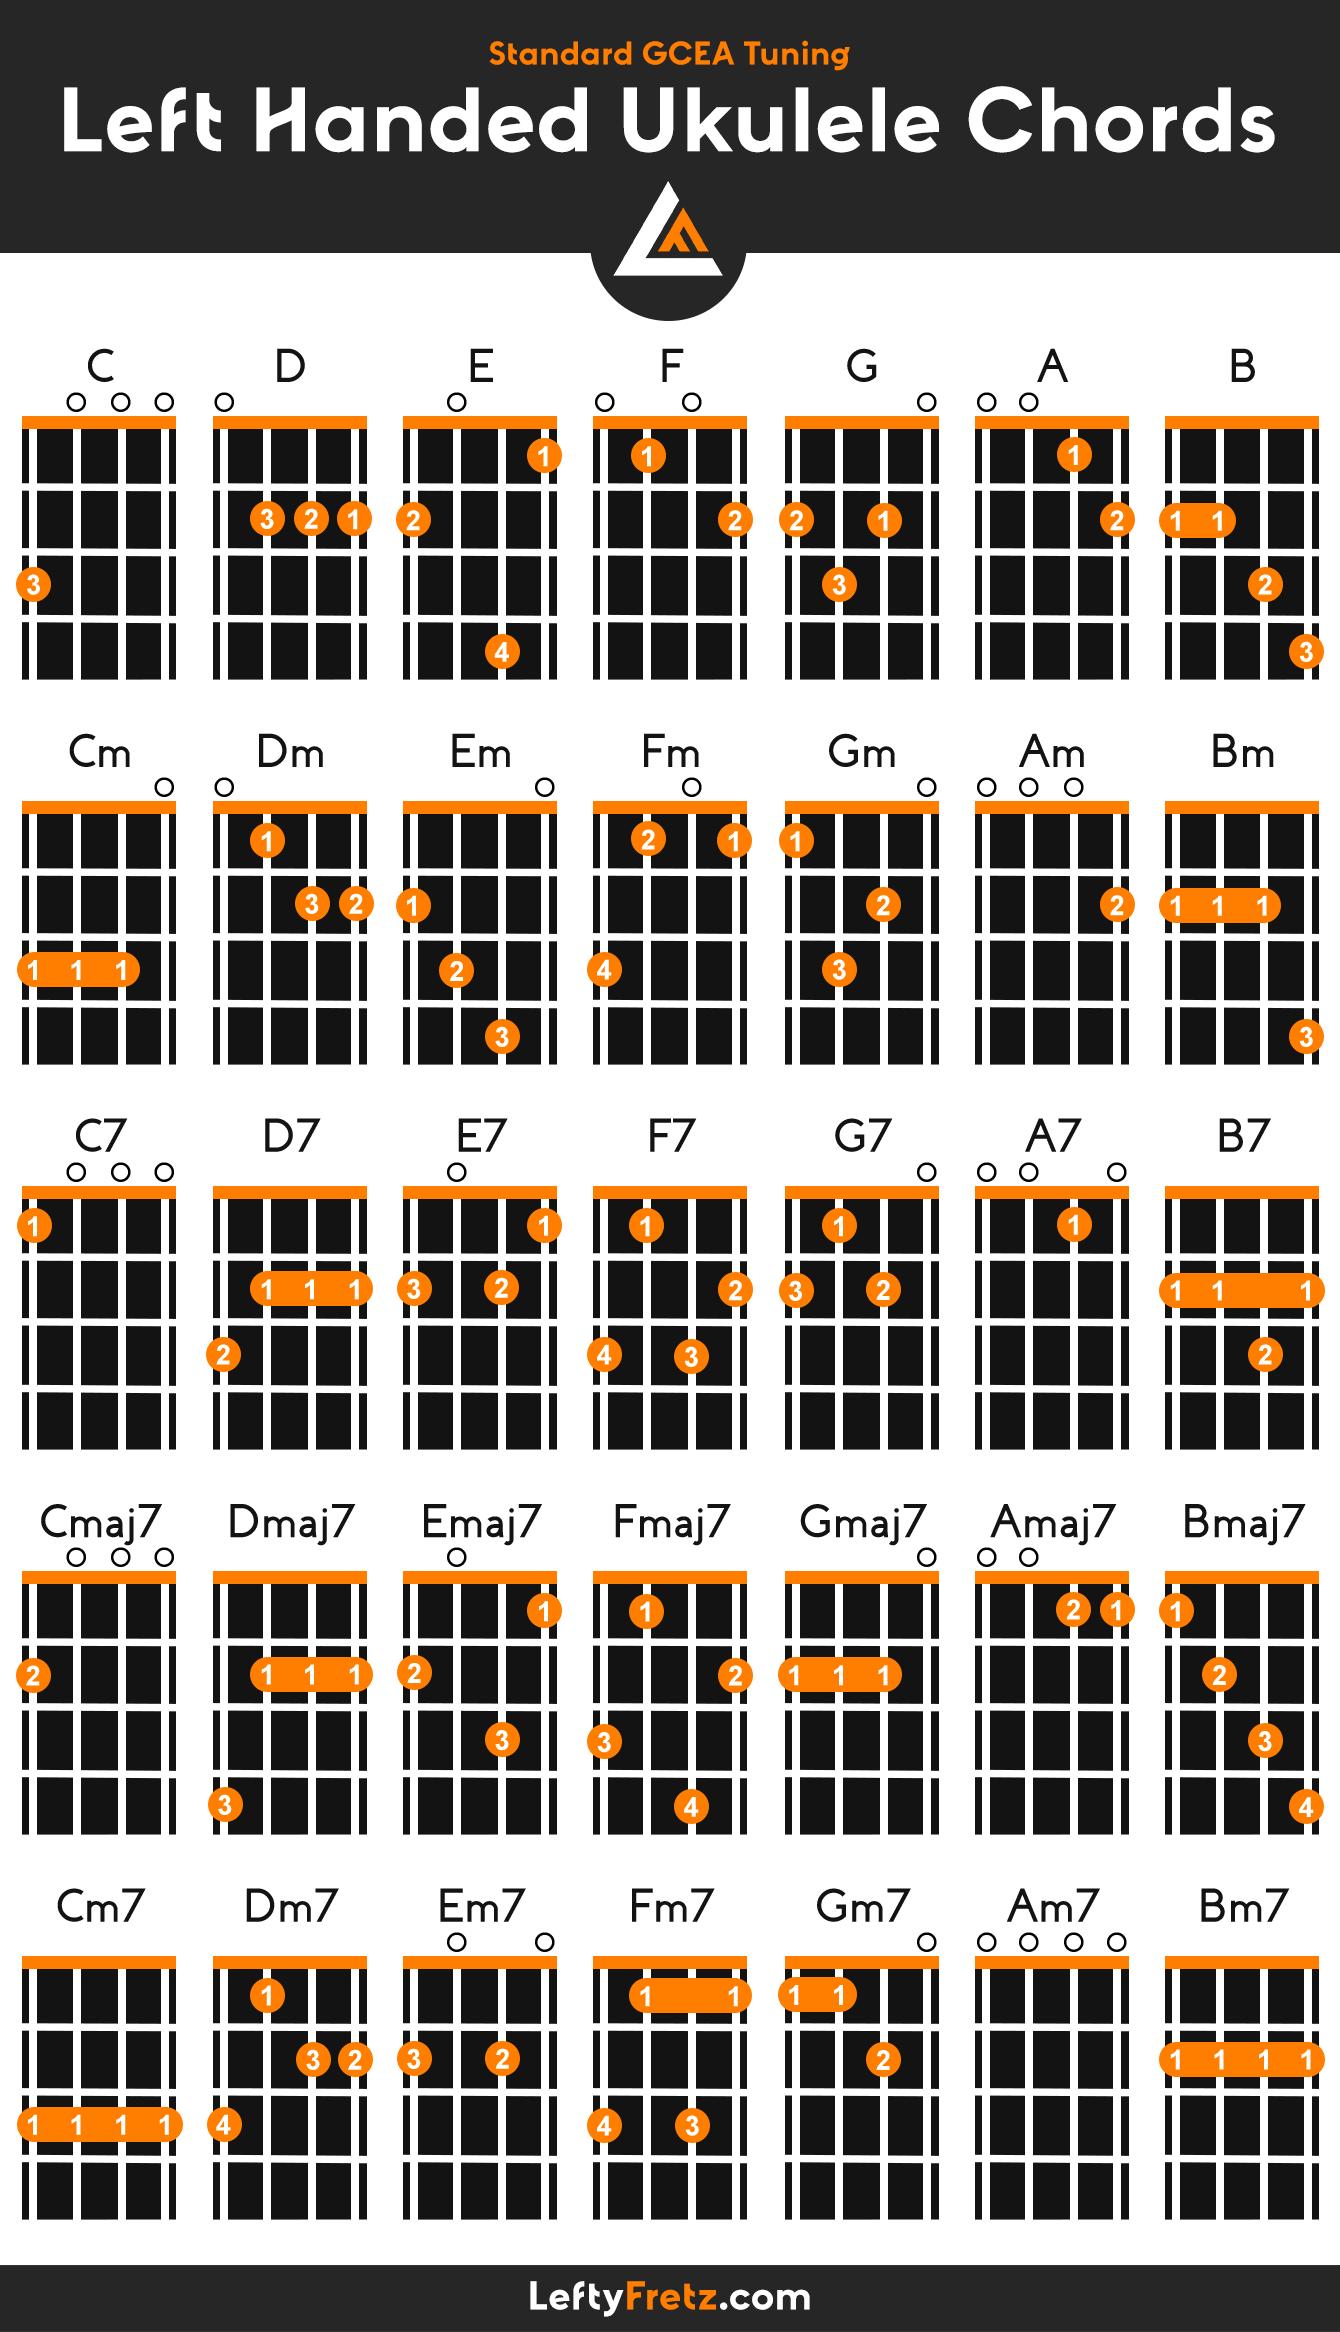 Left Handed Ukulele Chords